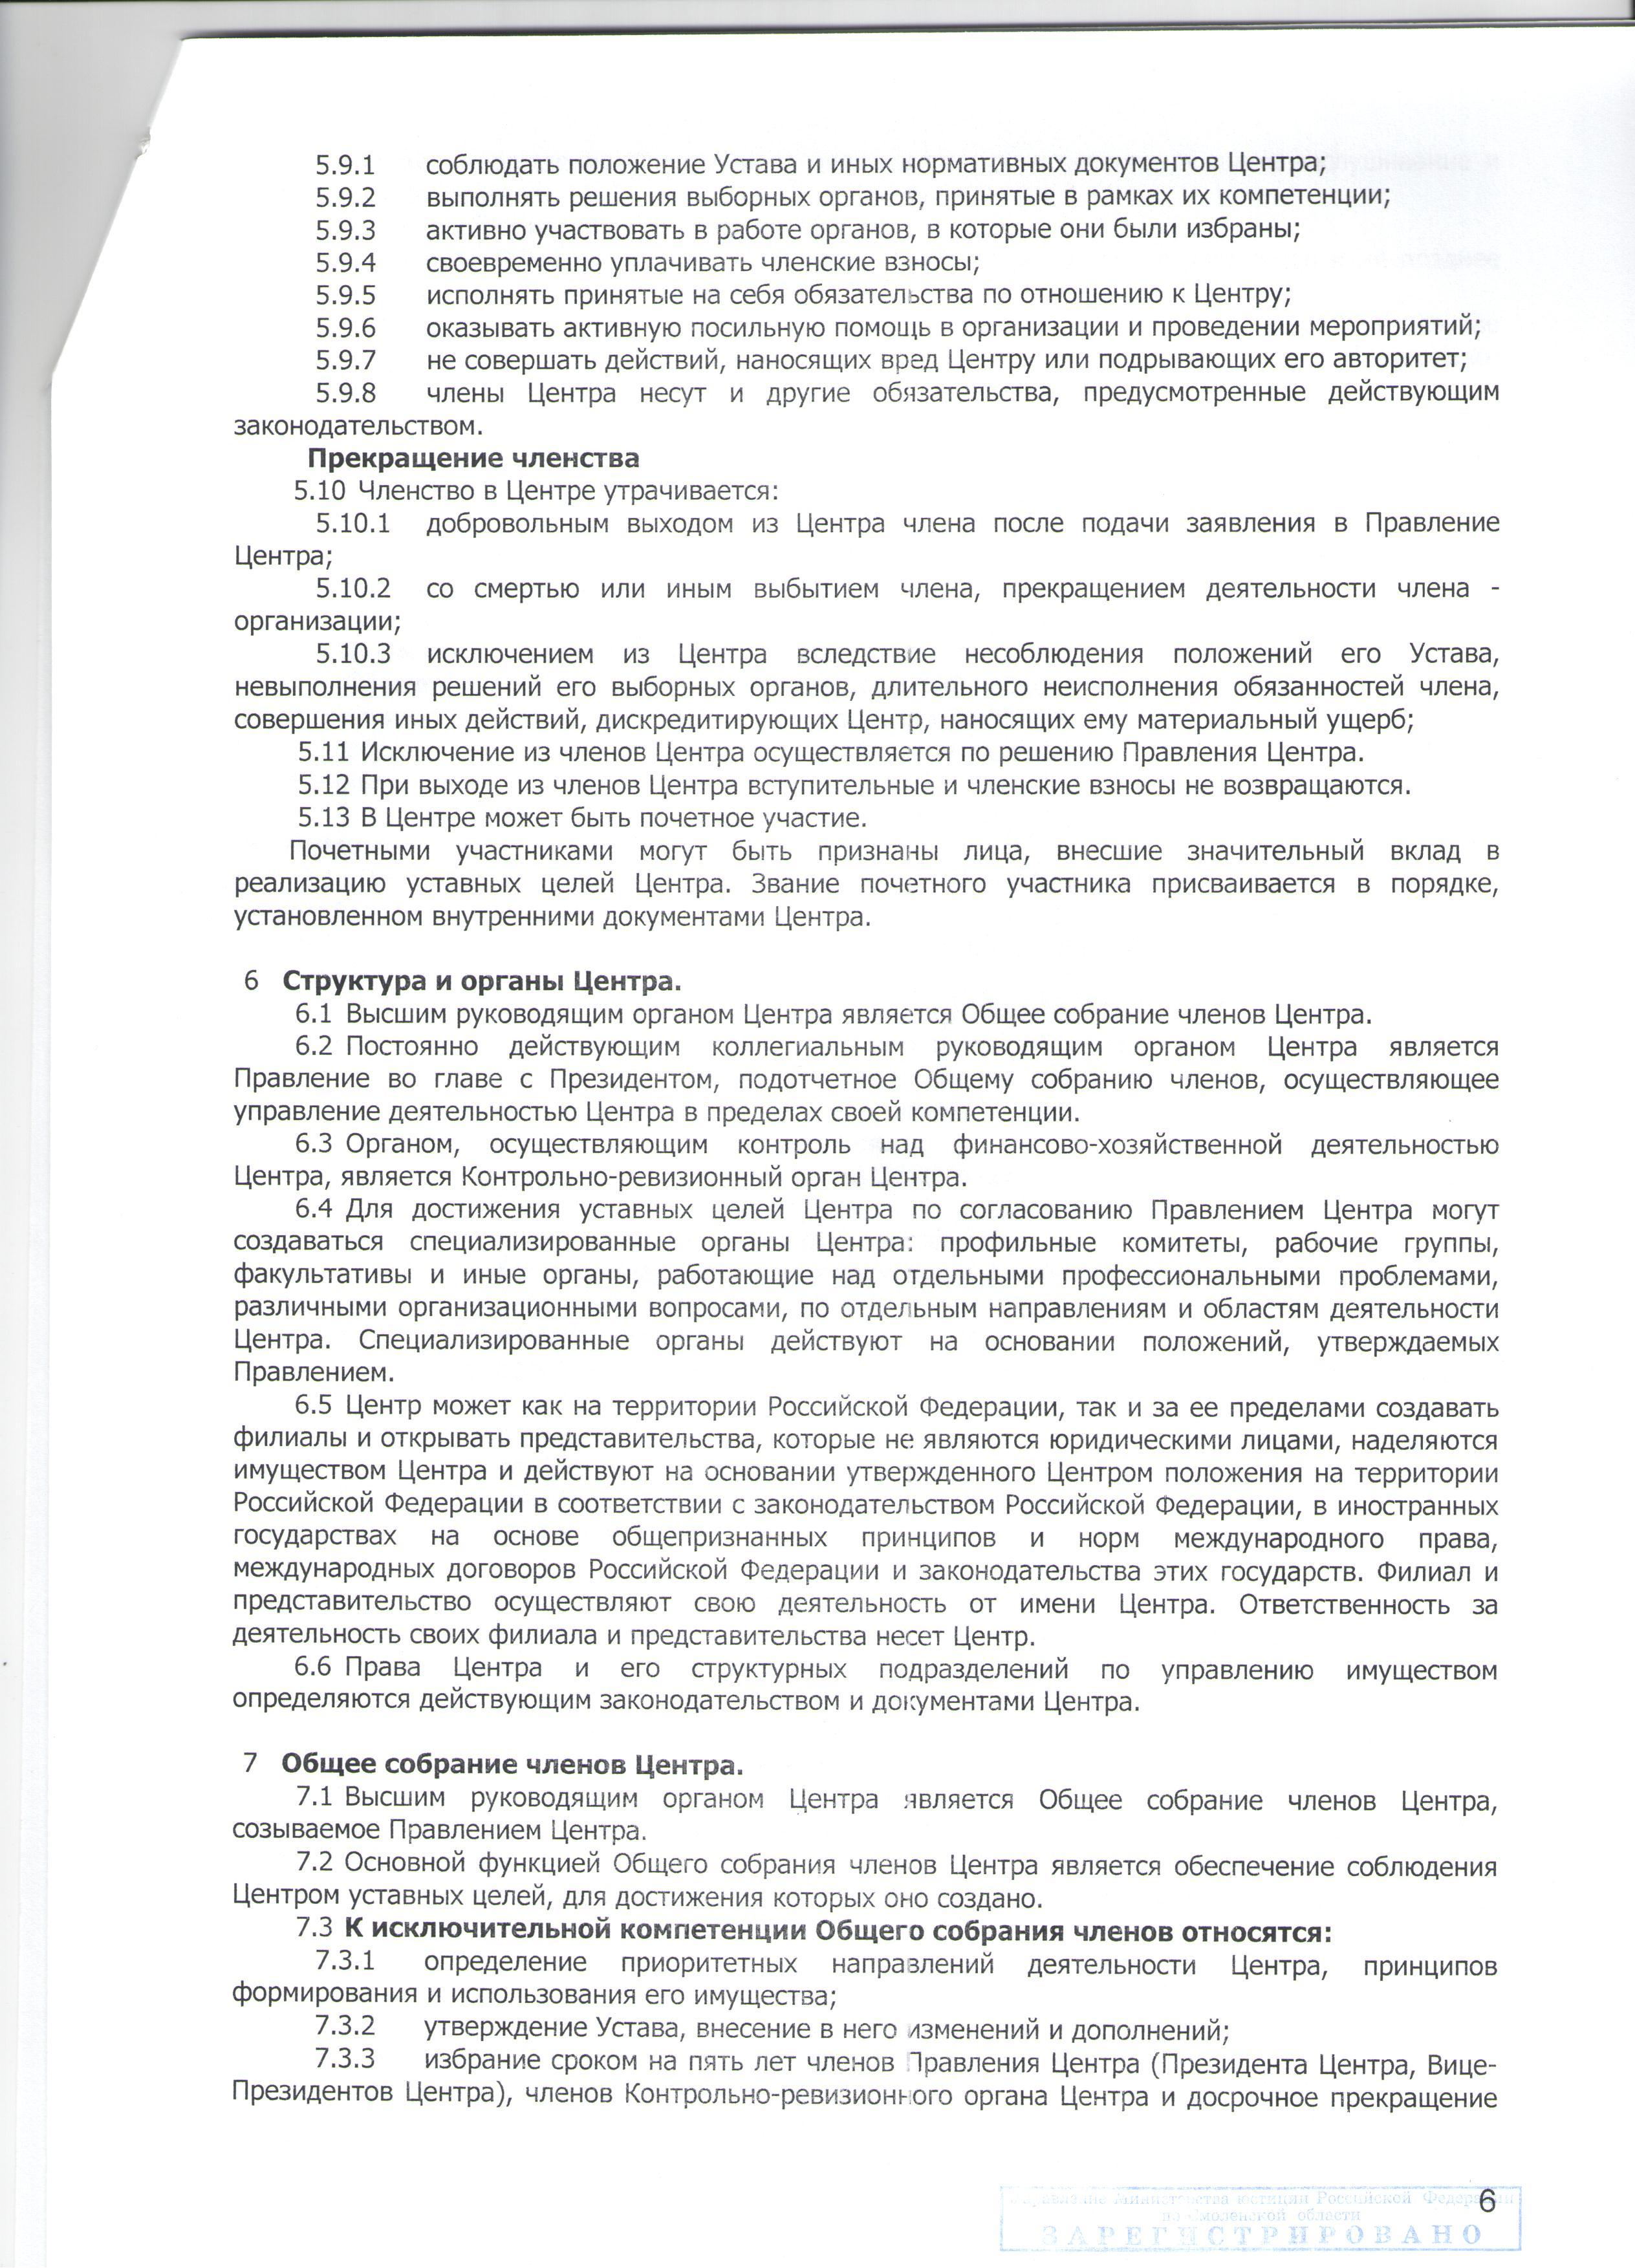 стр 6